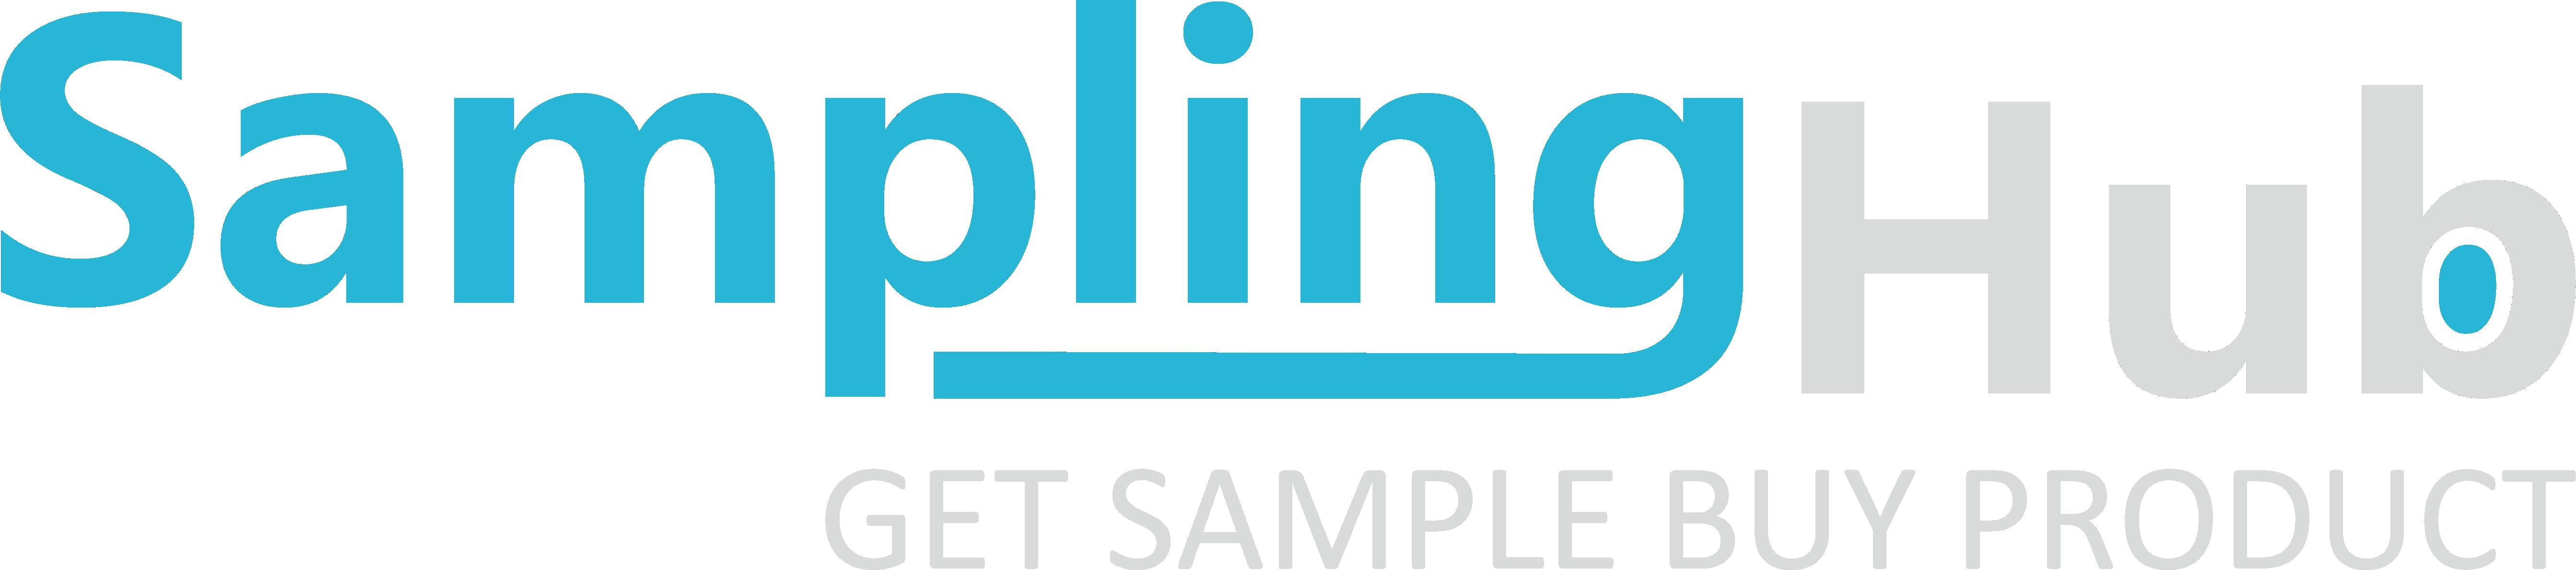 SamplingHub